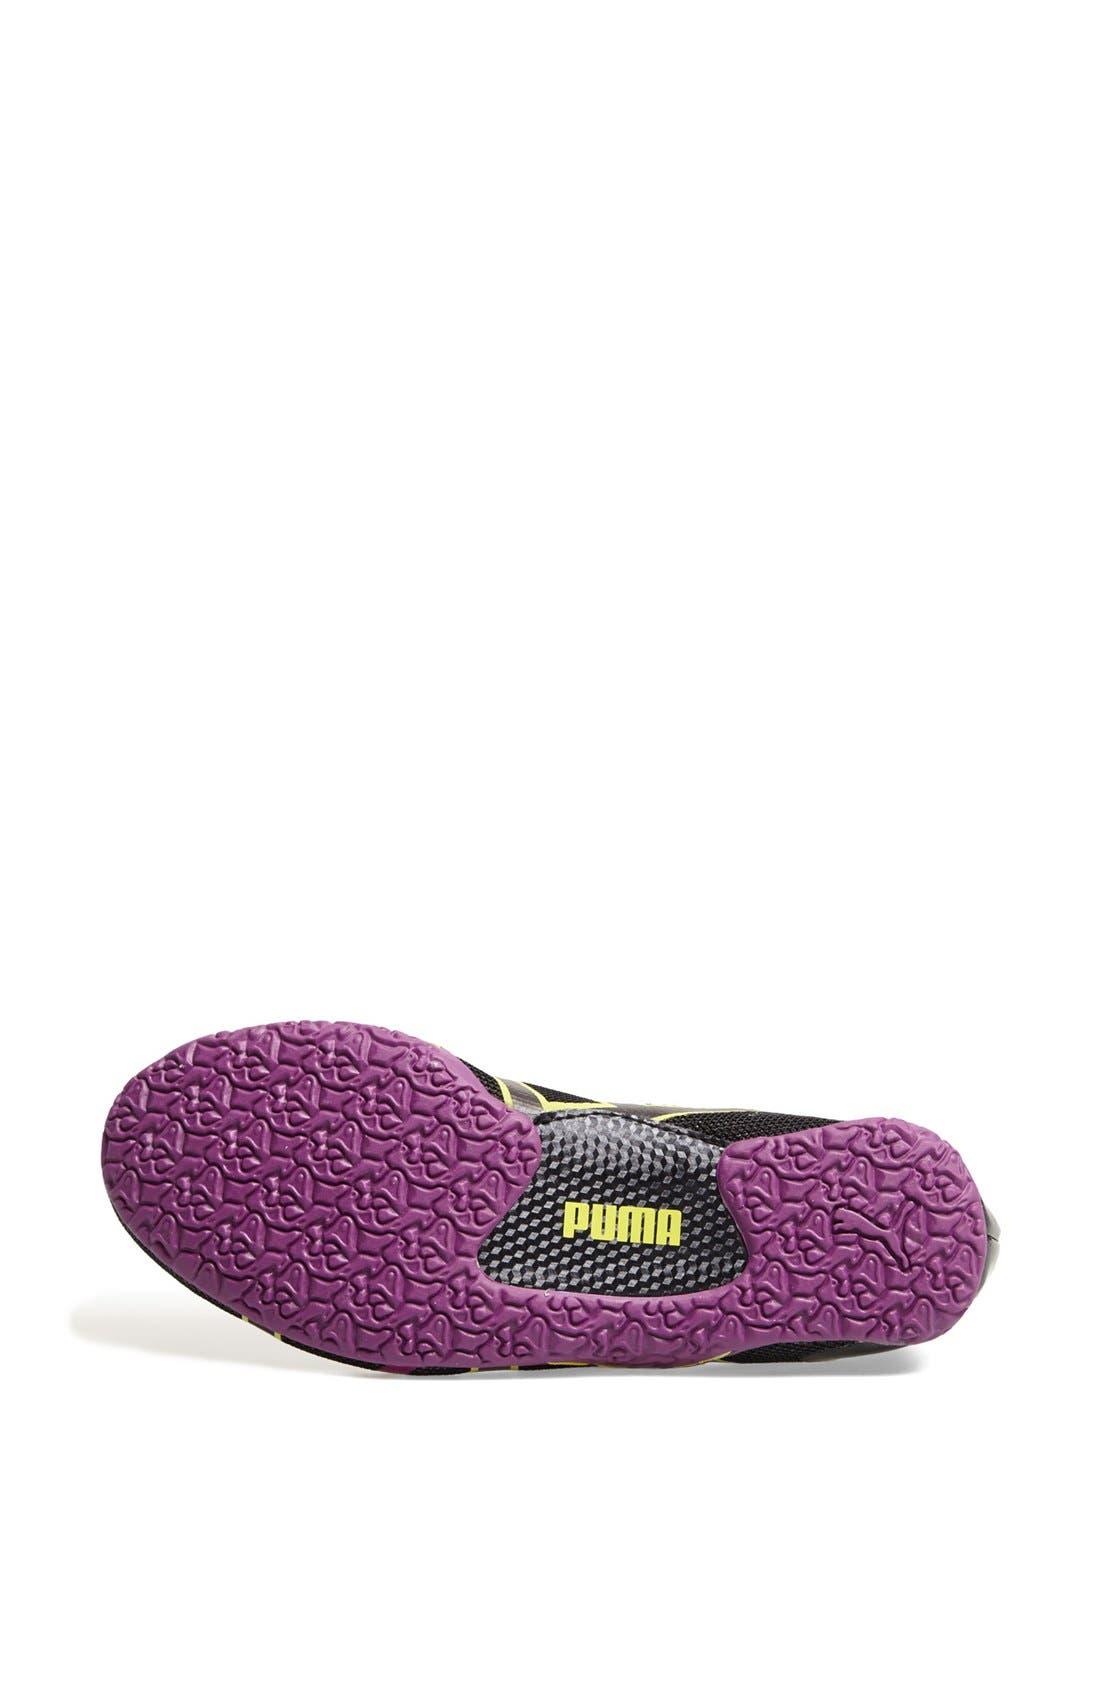 PUMA, 'Anaida' Foldable Sneaker, Alternate thumbnail 4, color, 001